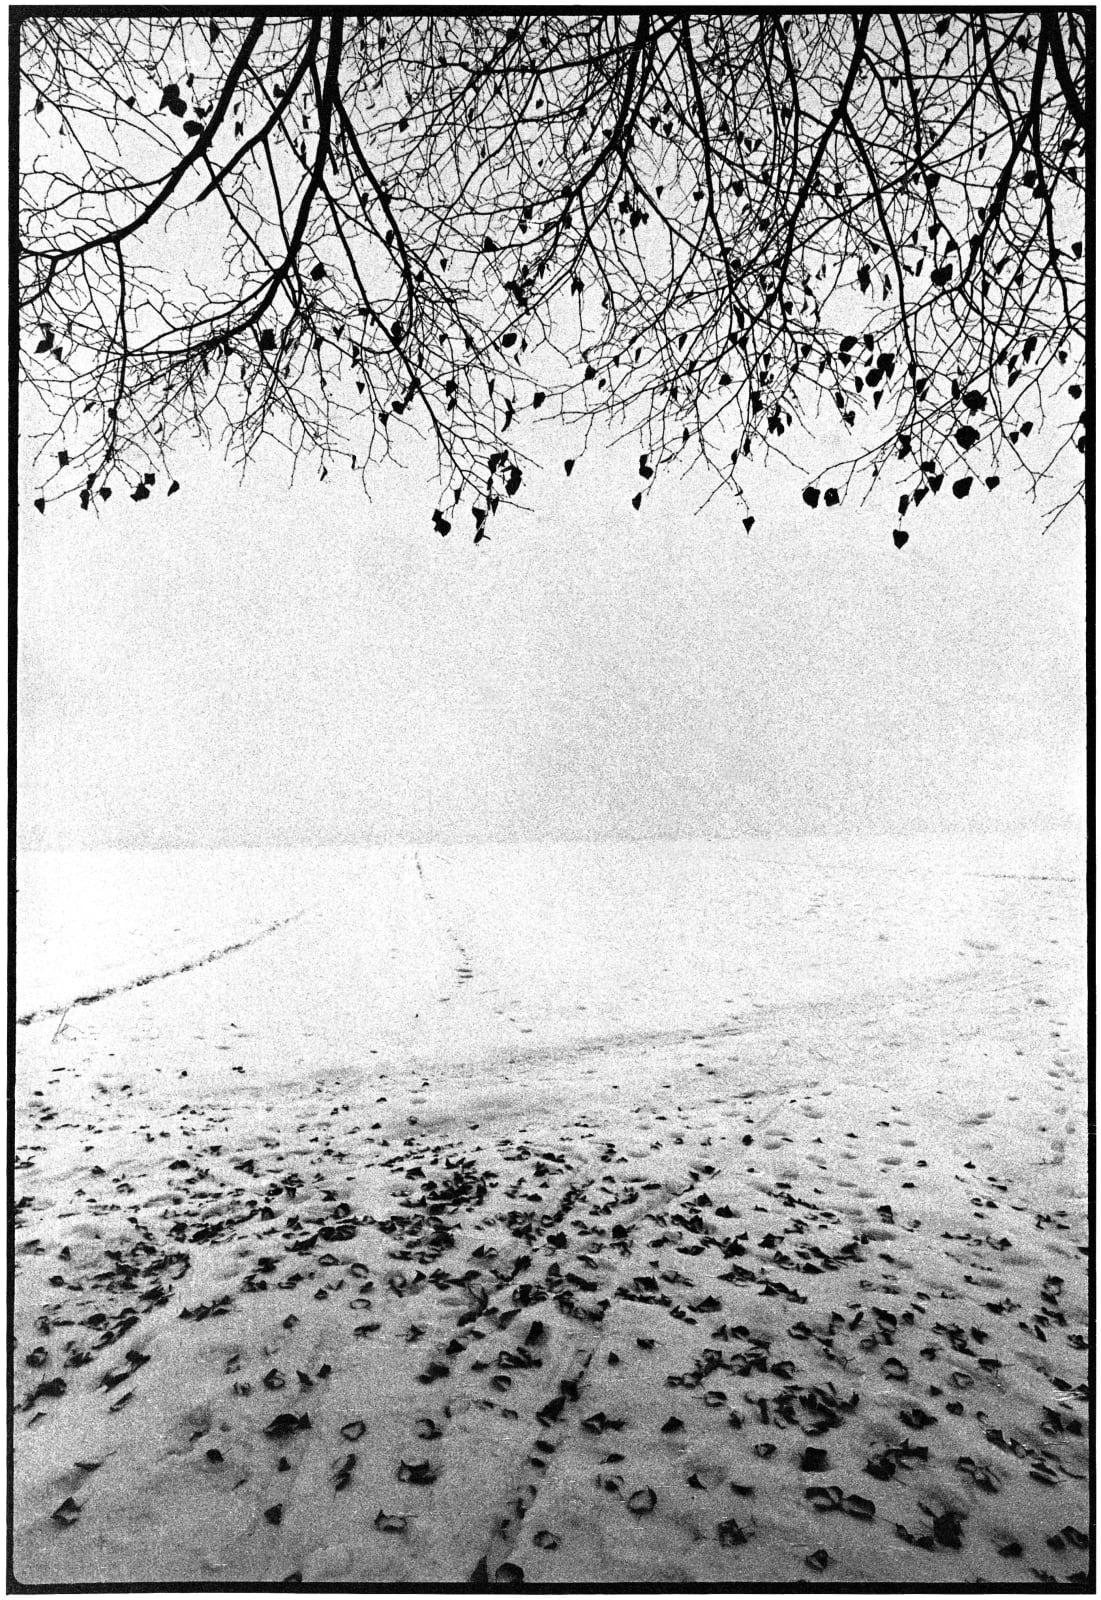 Janez Bogataj, Pastorala I/12, 1980